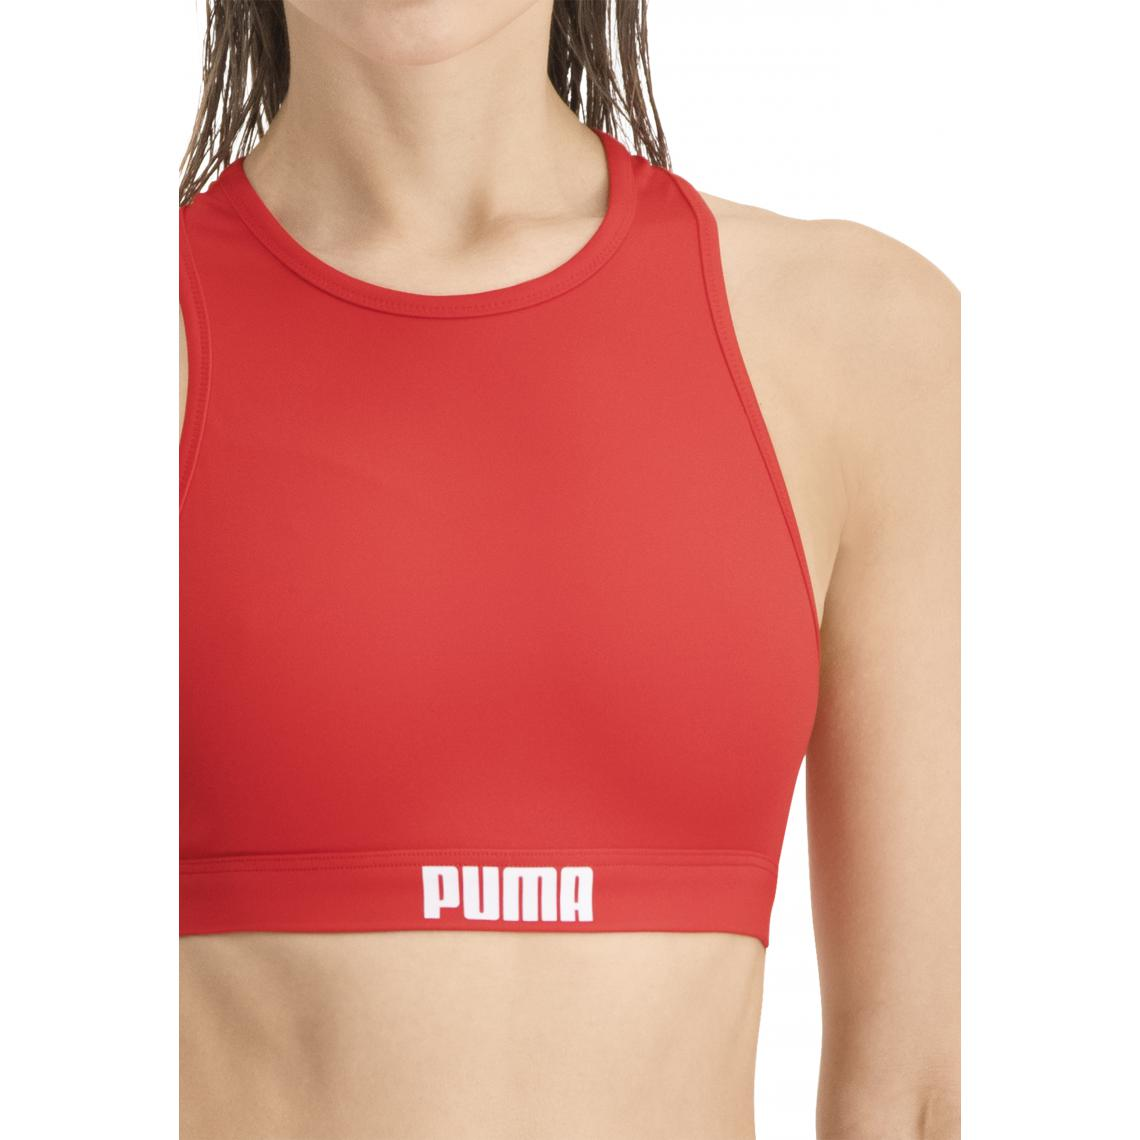 Haut de Maillot de Bain brassière Rouge Puma - Puma femme - Modalova